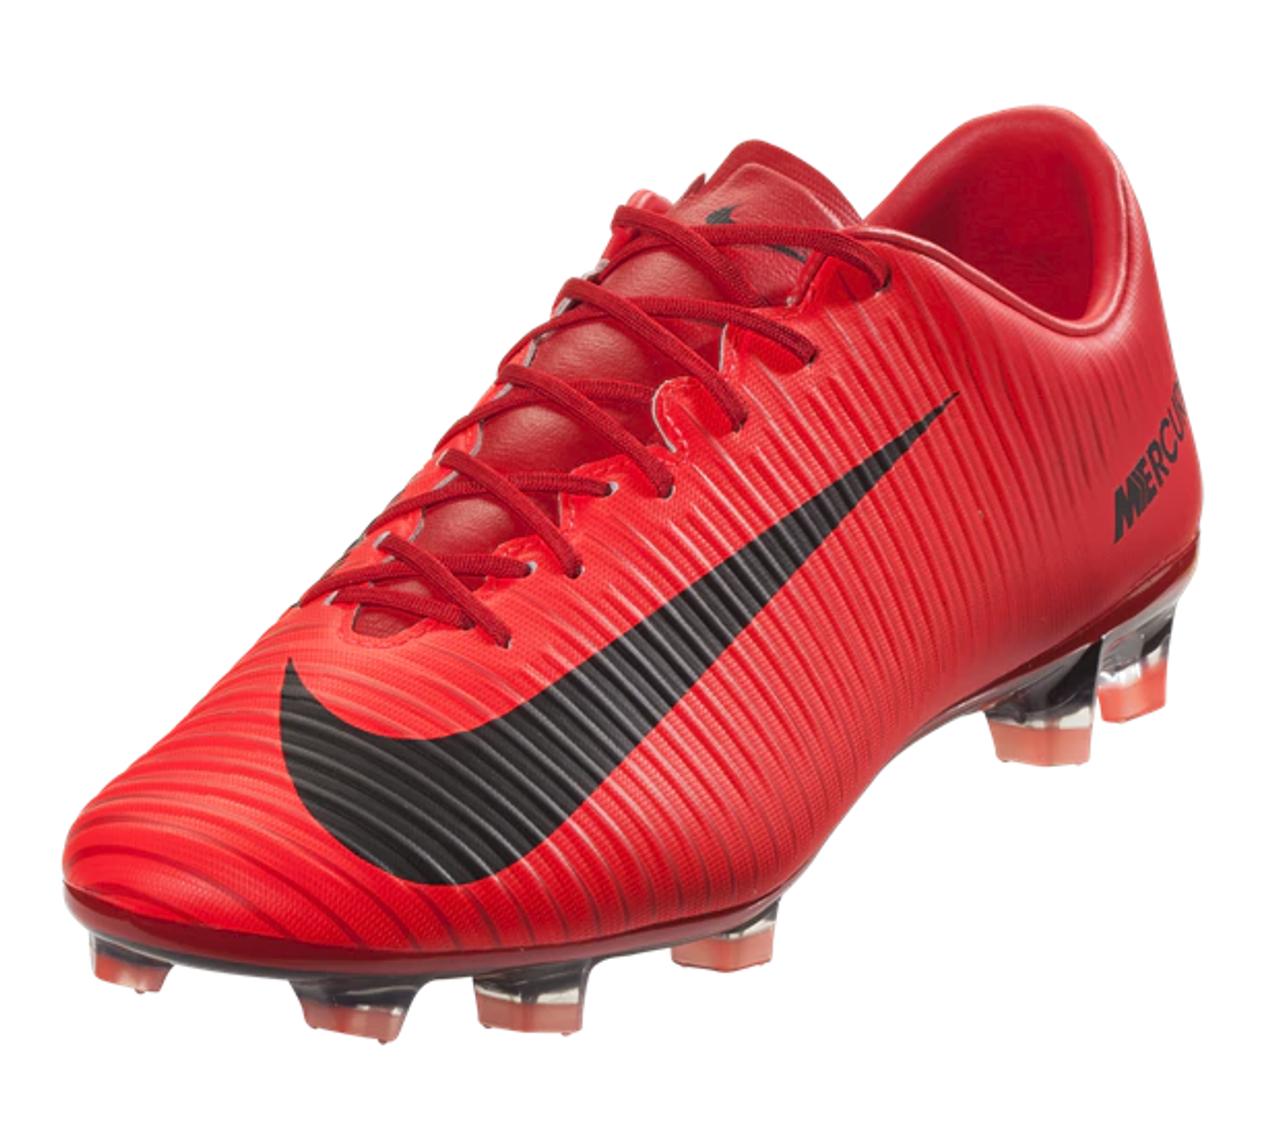 1f7efb2ae Nike Mercurial Veloce III FG - University Red Black RC (052519) - ohp soccer